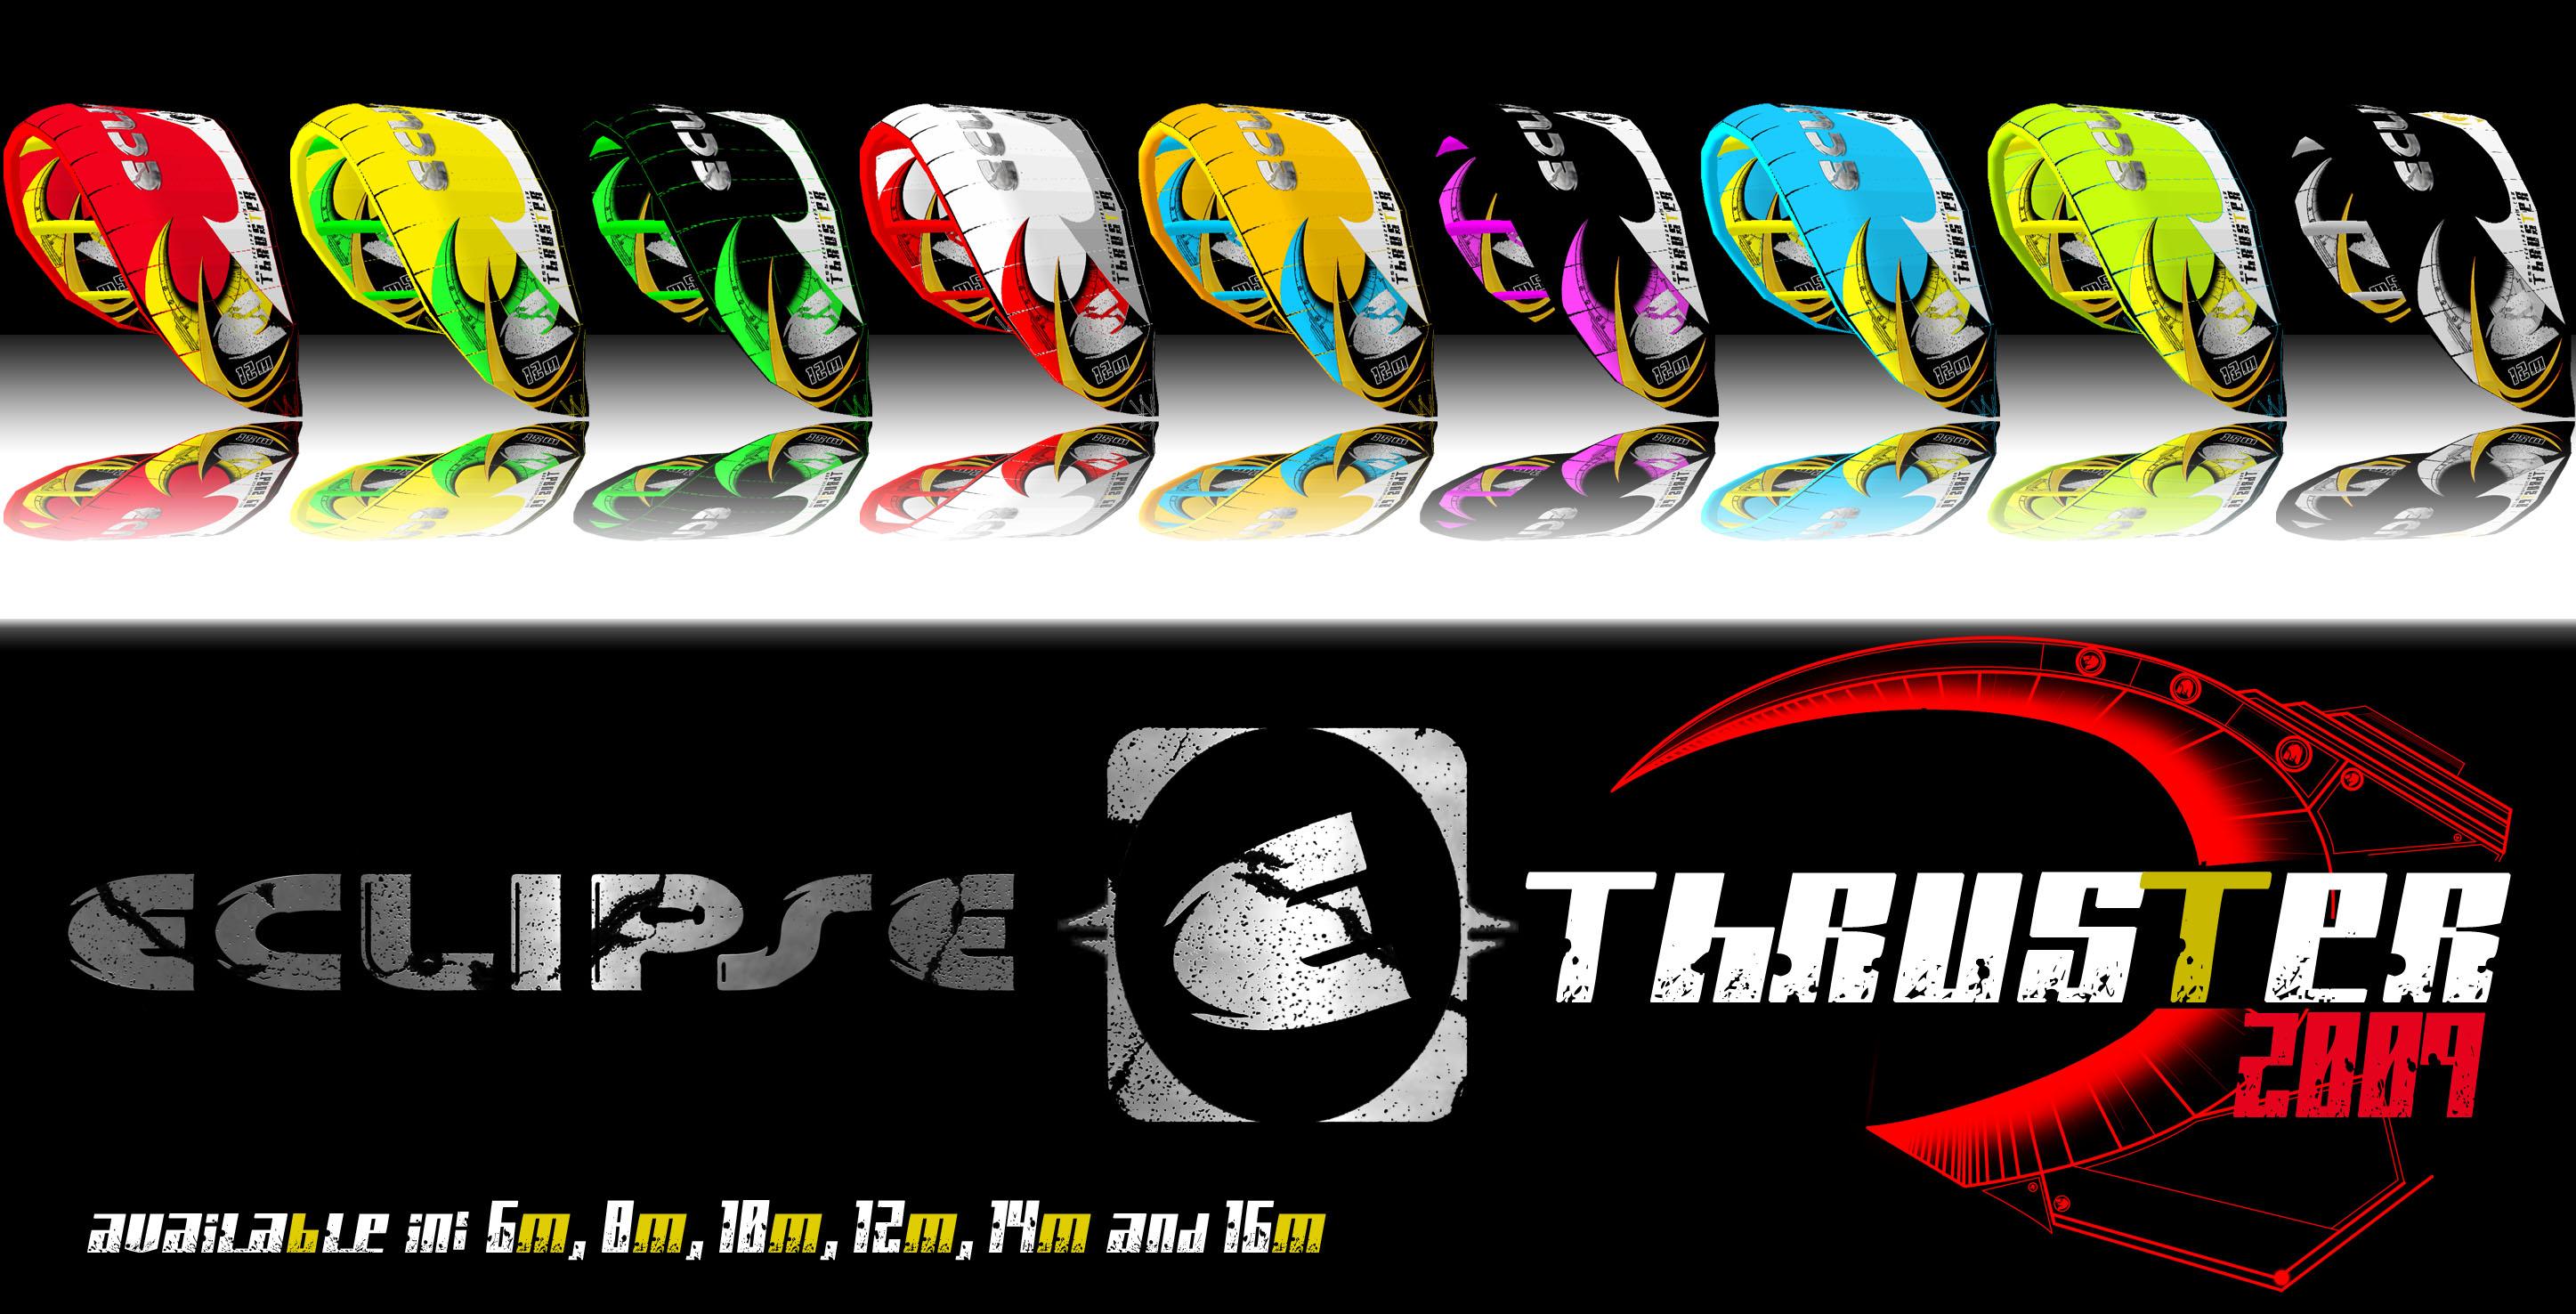 Eclipse thruster 2009 line up - work in progress